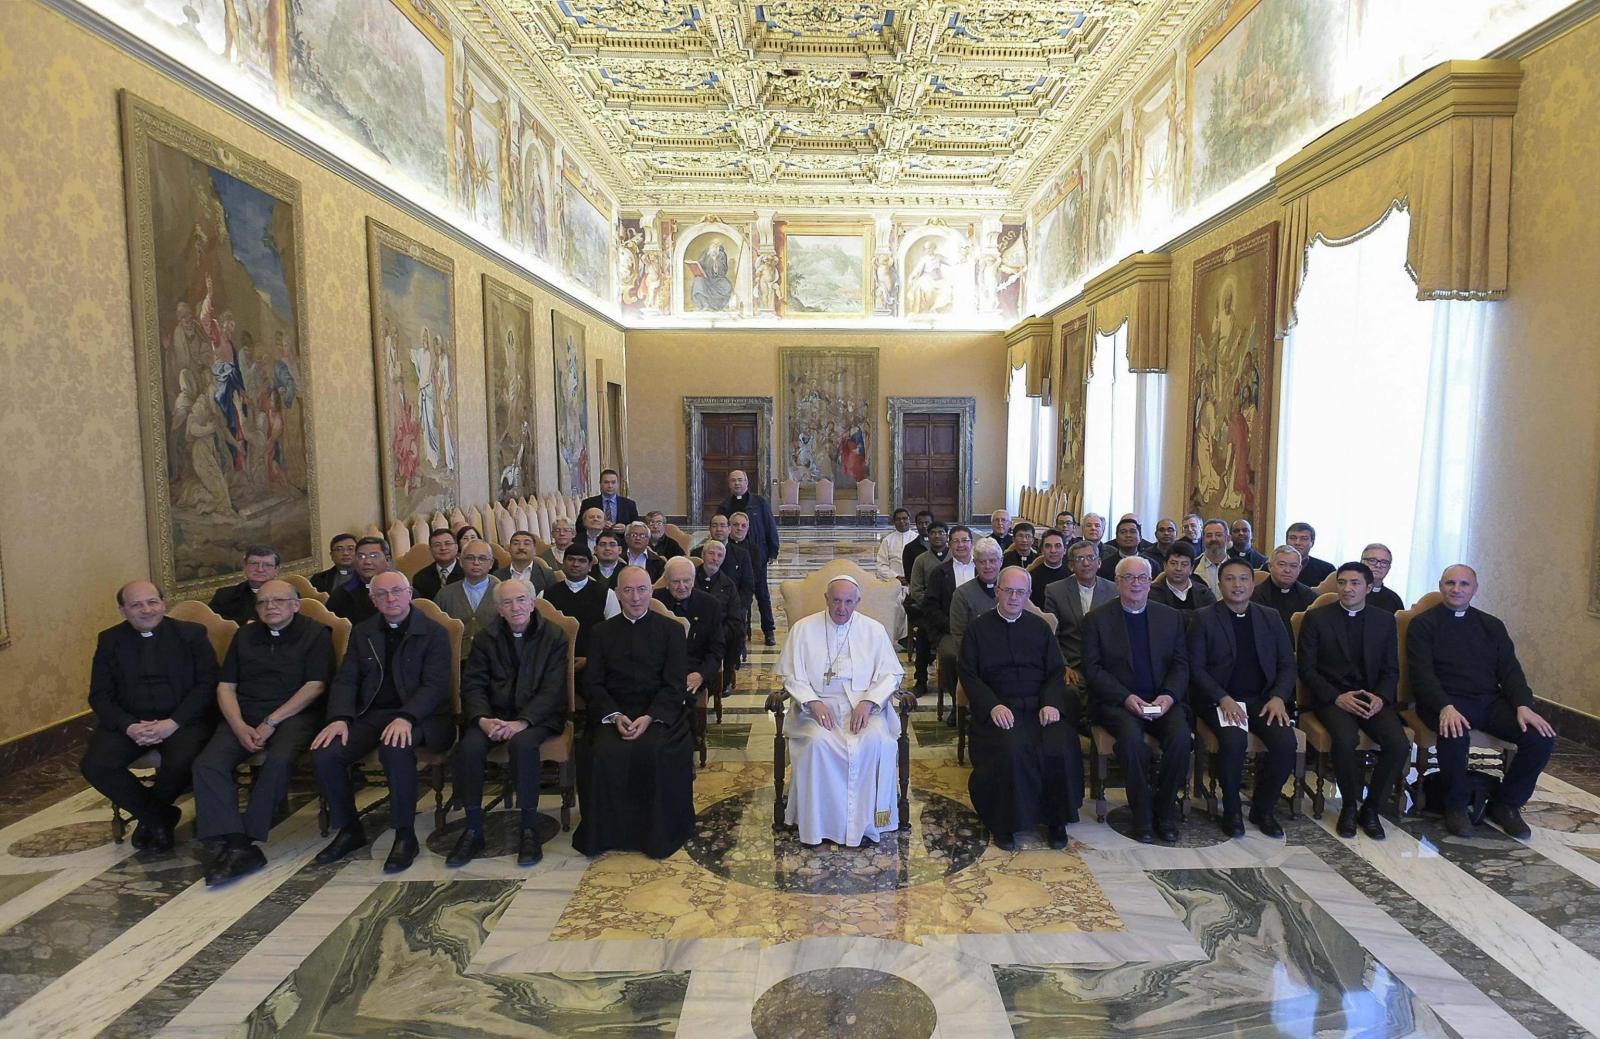 Spotkanie papieża Franciszka z ojcami somaskimi. Fot. PAP/EPA/L'OSSERVATORE ROMANO